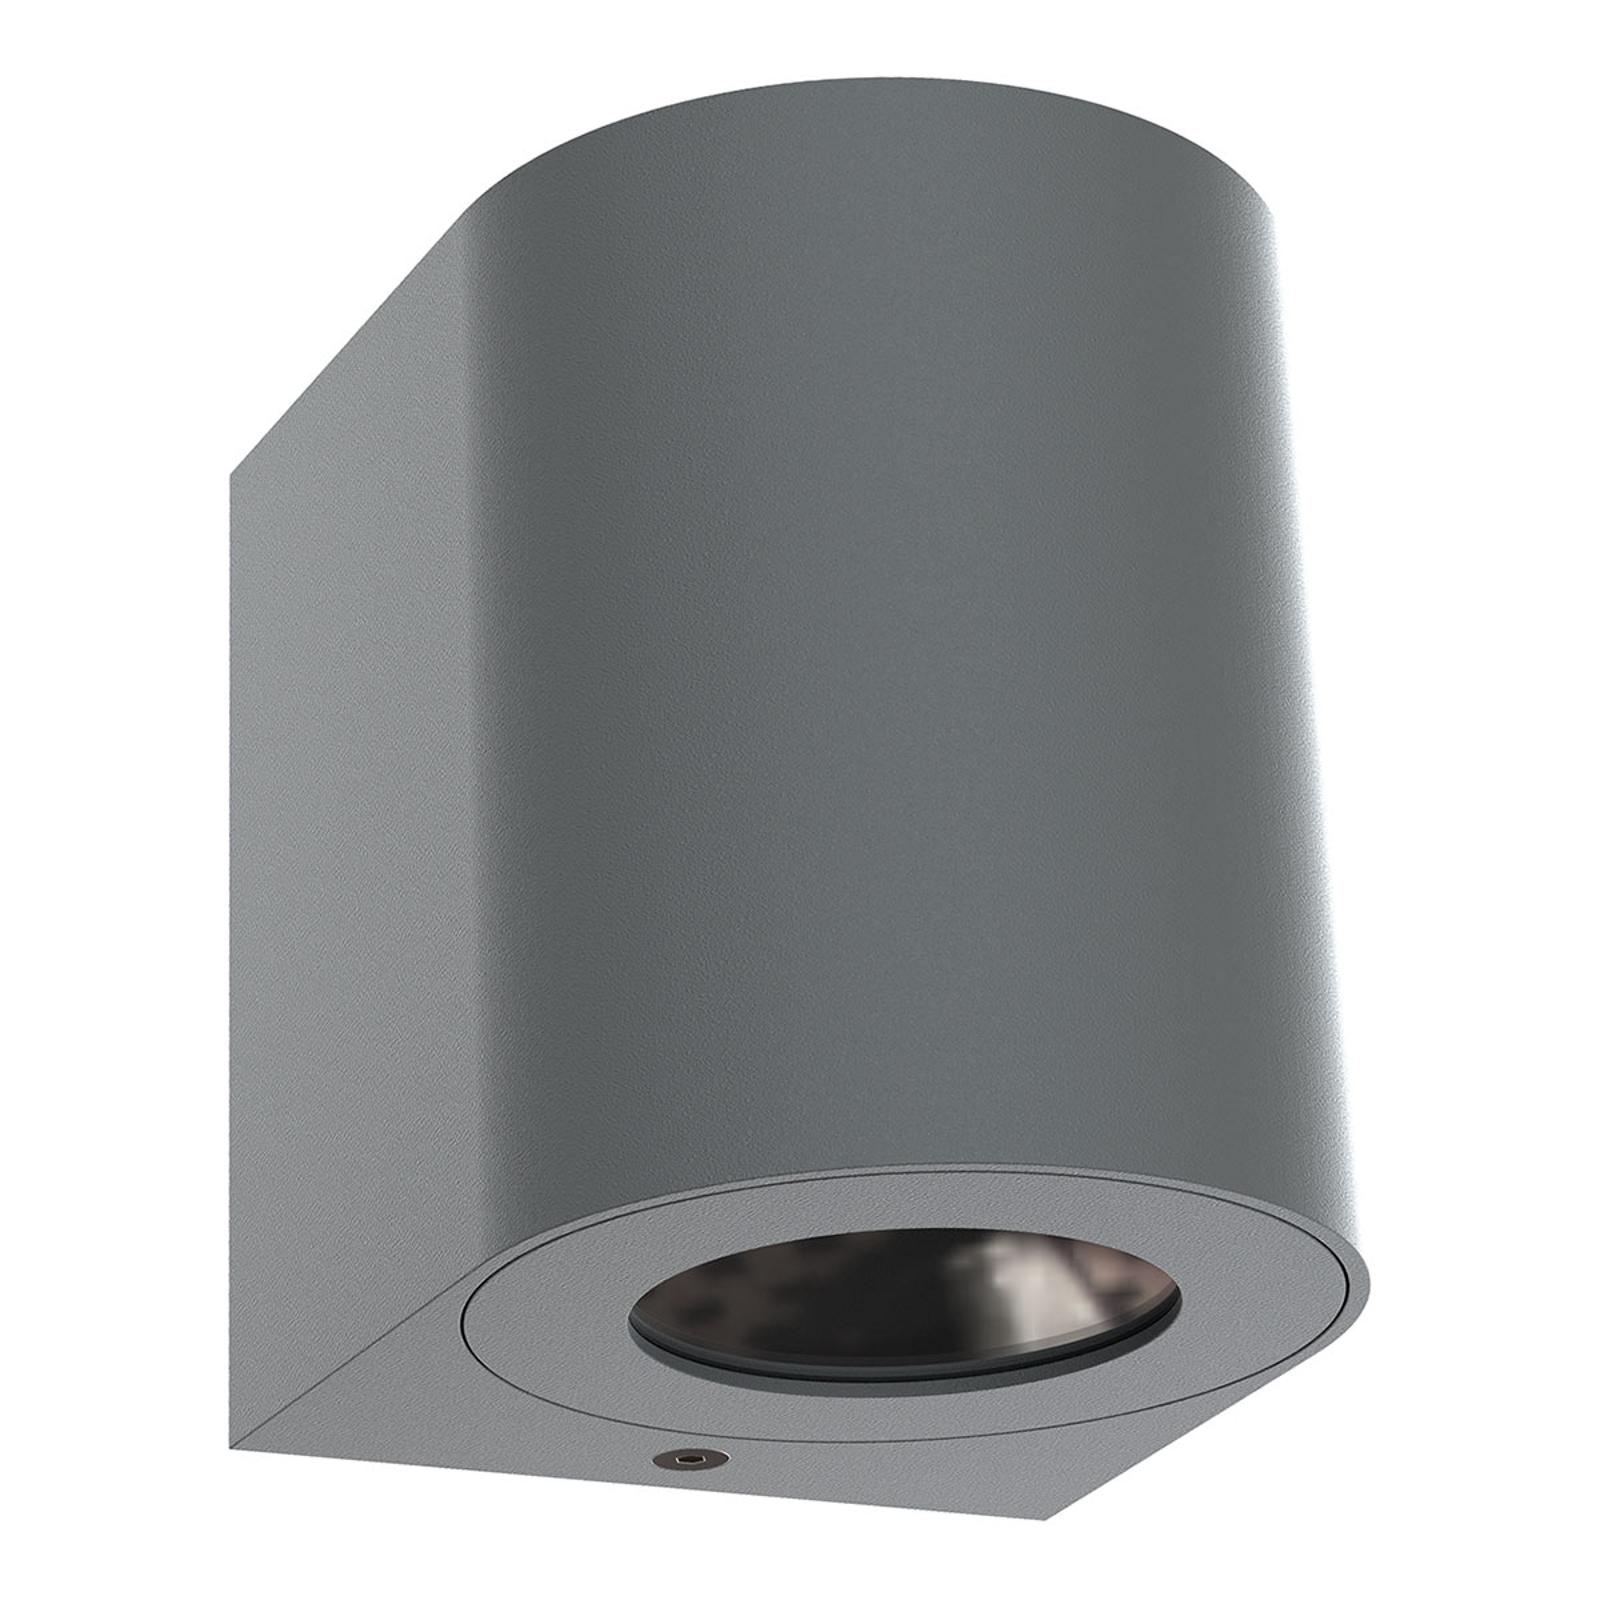 LED buitenwandlamp Canto 2, 10 cm, grijs